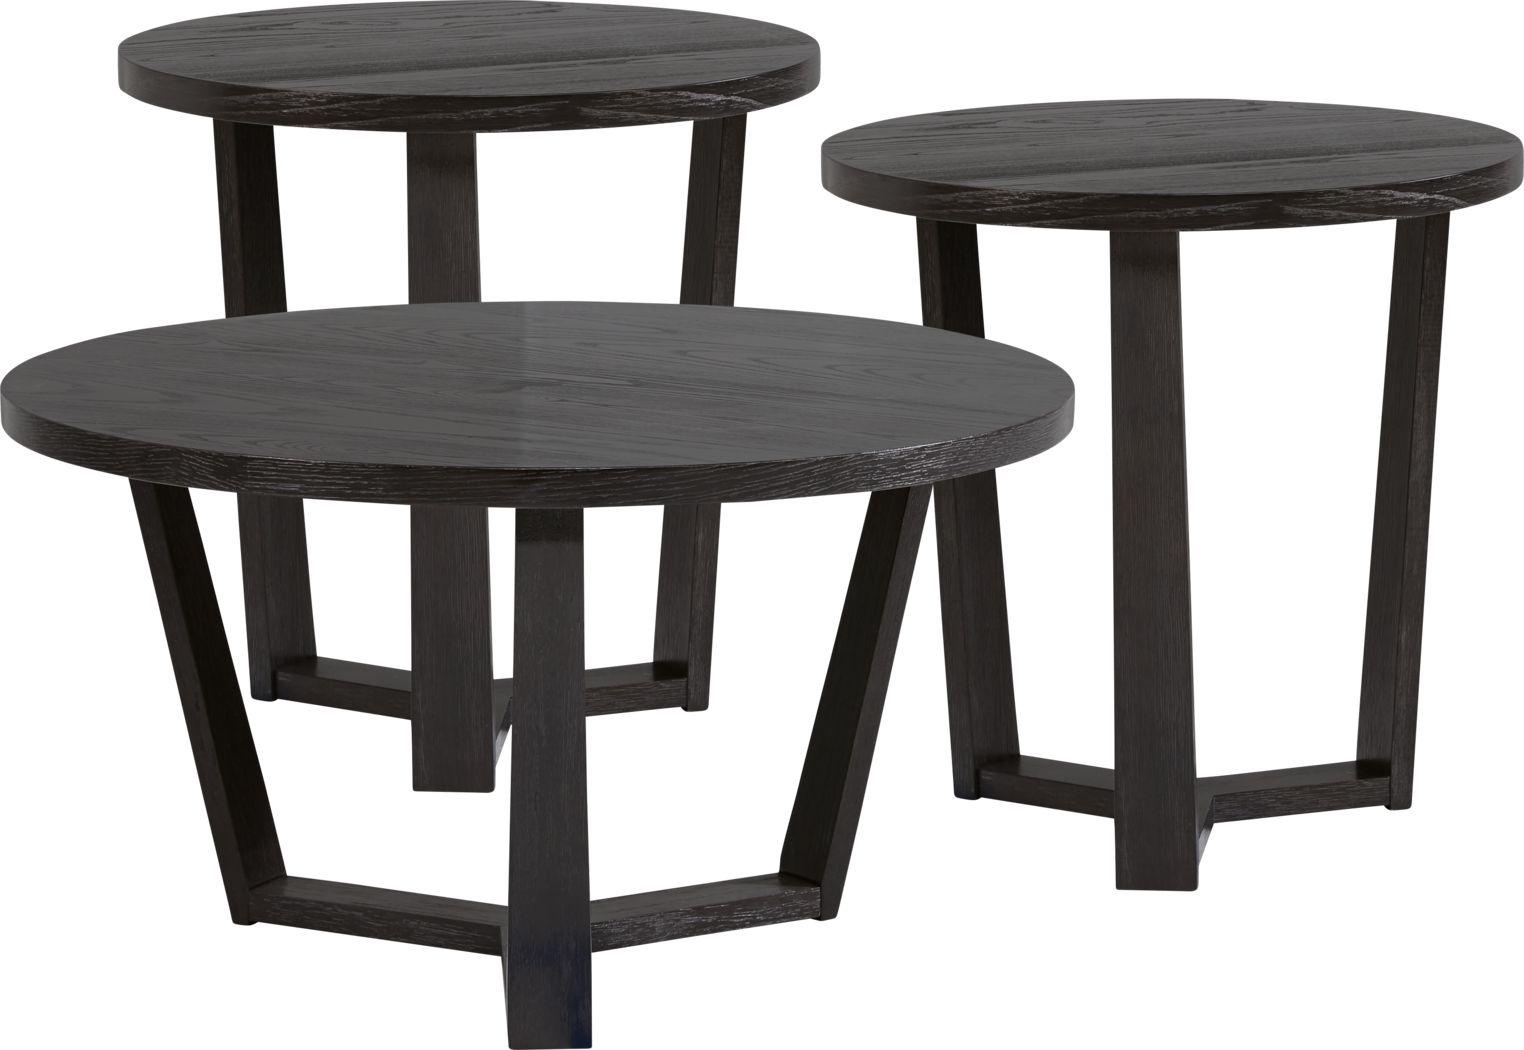 Rumie Dark Brown 3 Pc Table Set